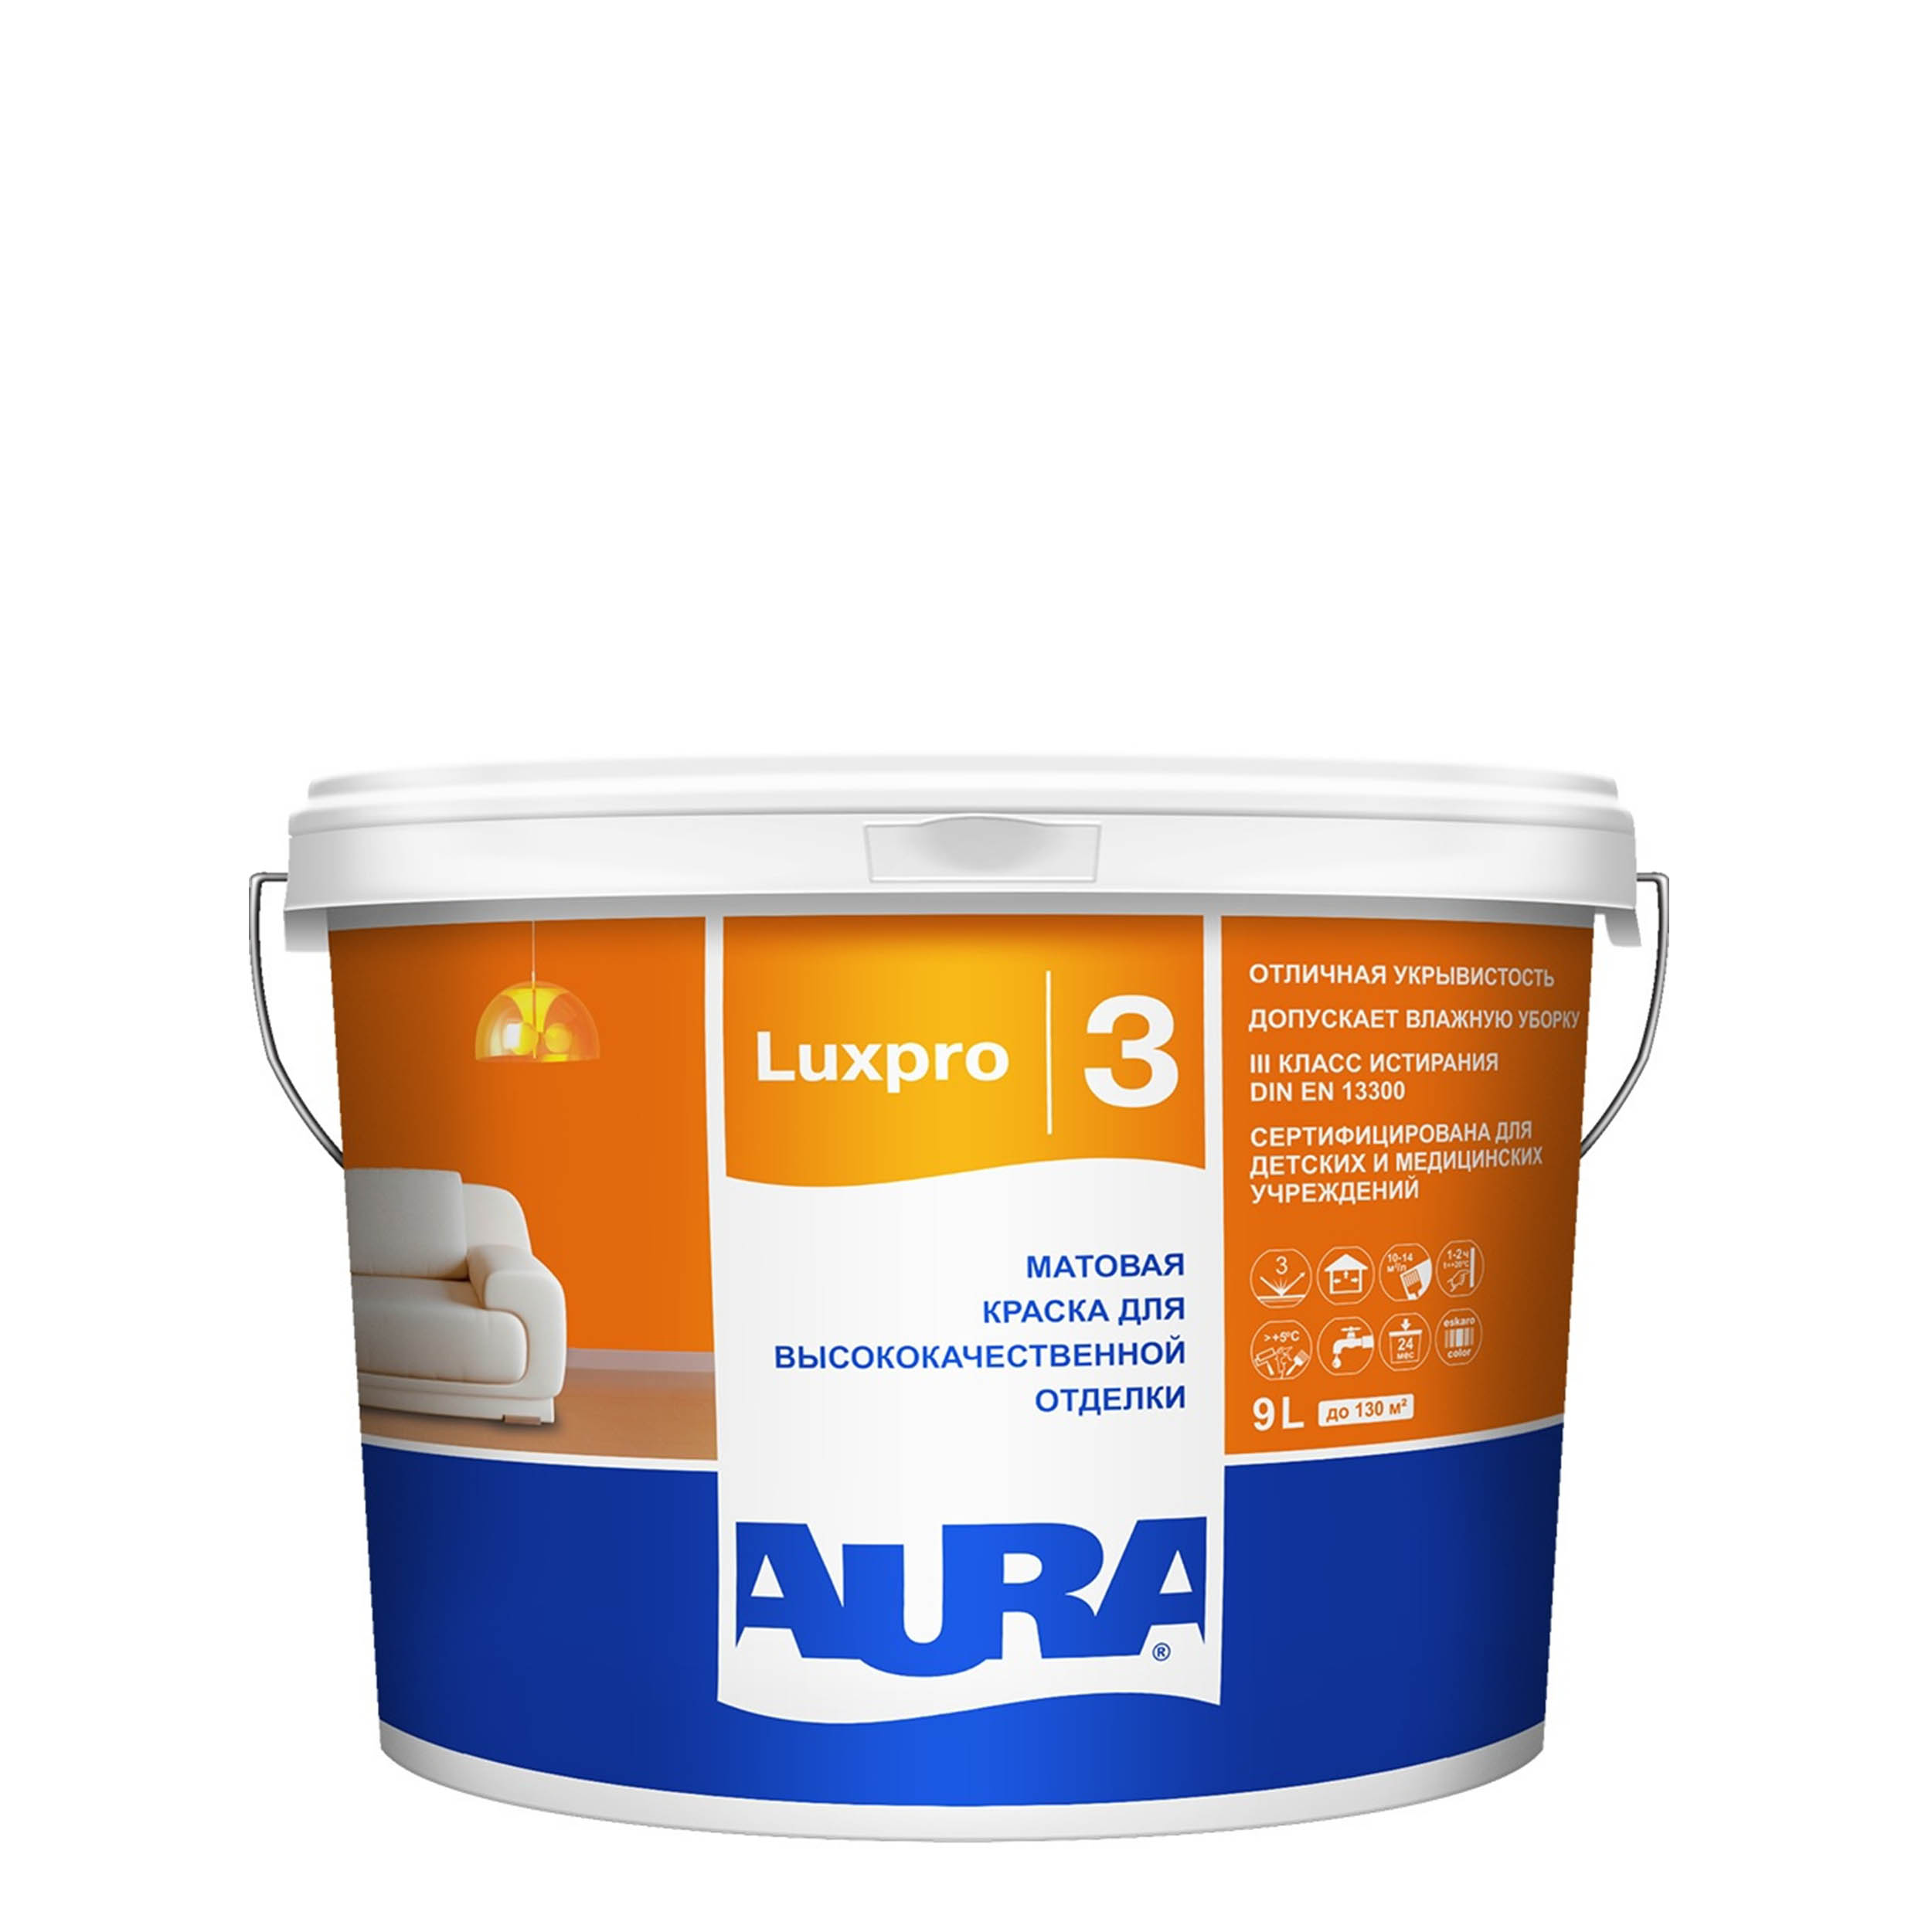 Фото 3 - Краска интерьерная, Aura LuxPRO 3, RAL 6011, 11 кг.